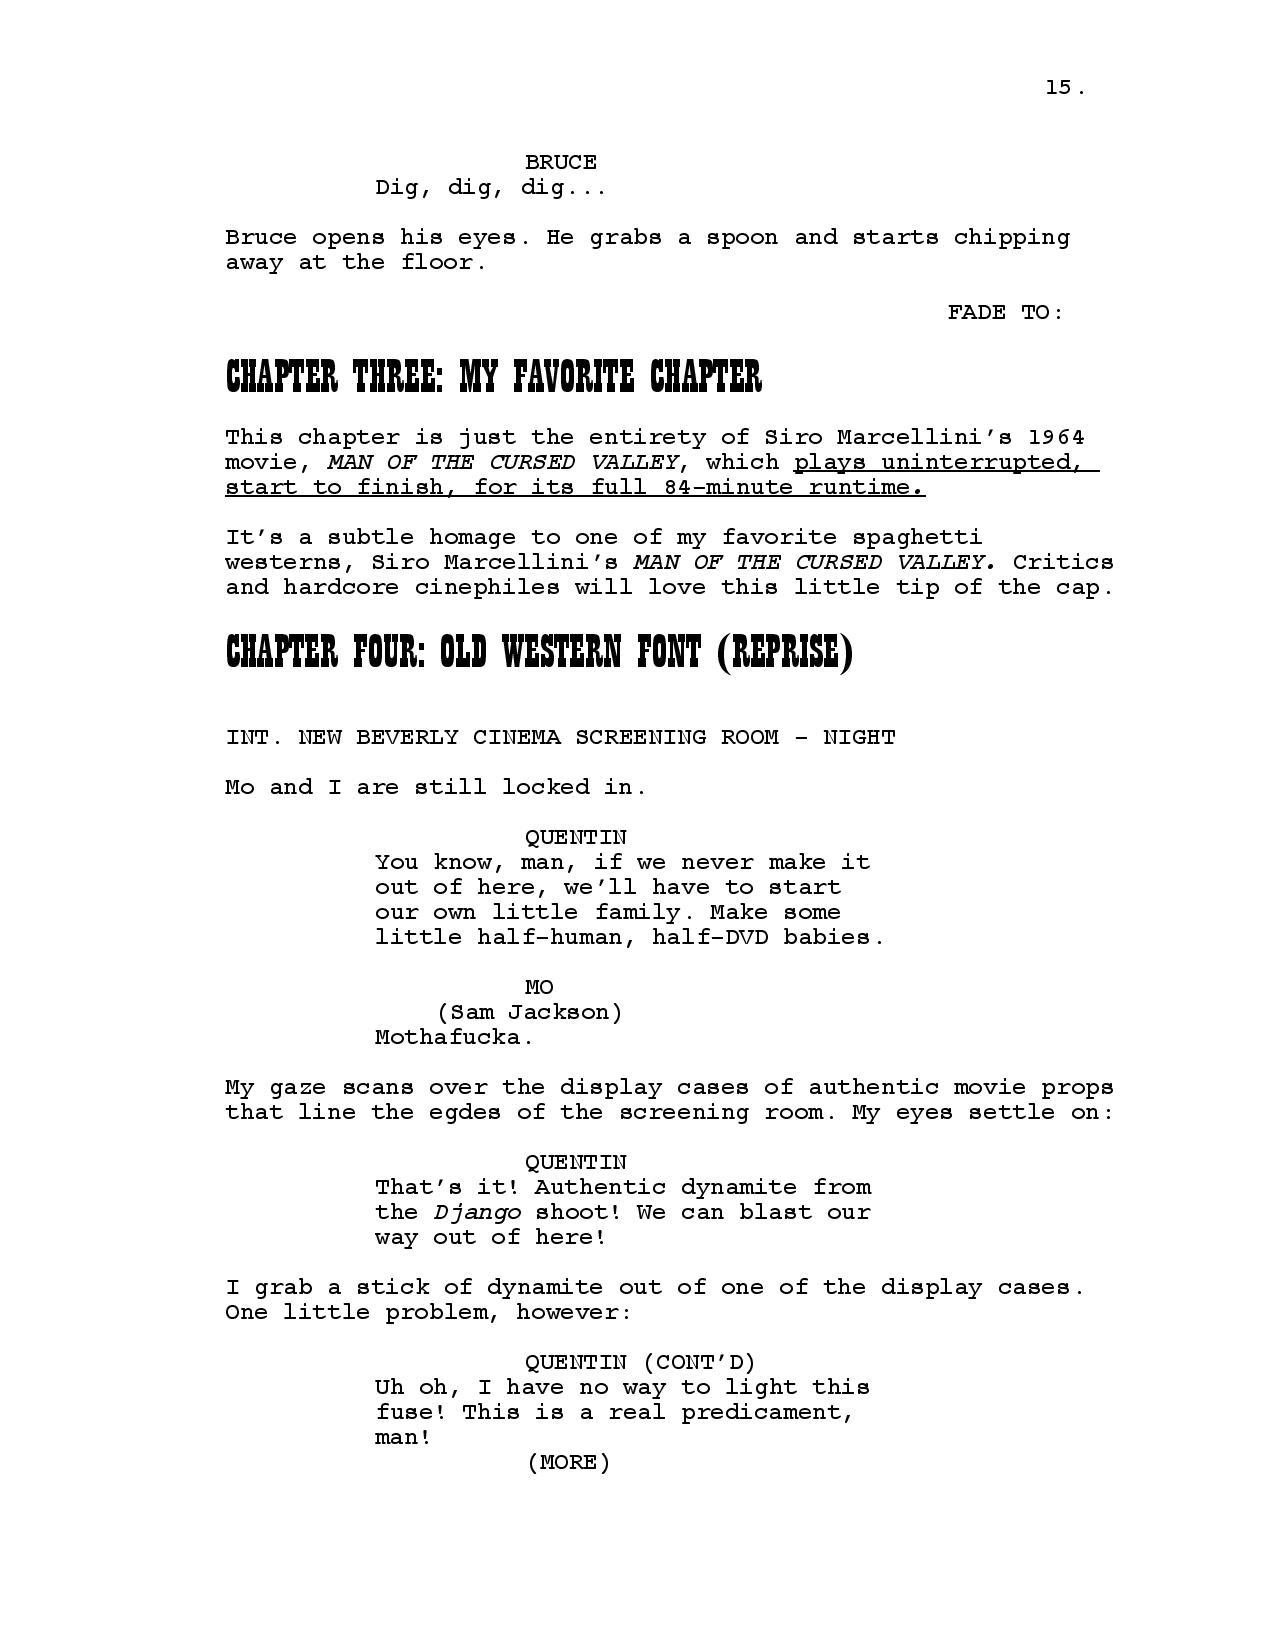 New Tarantino Screenplay-1-page-016